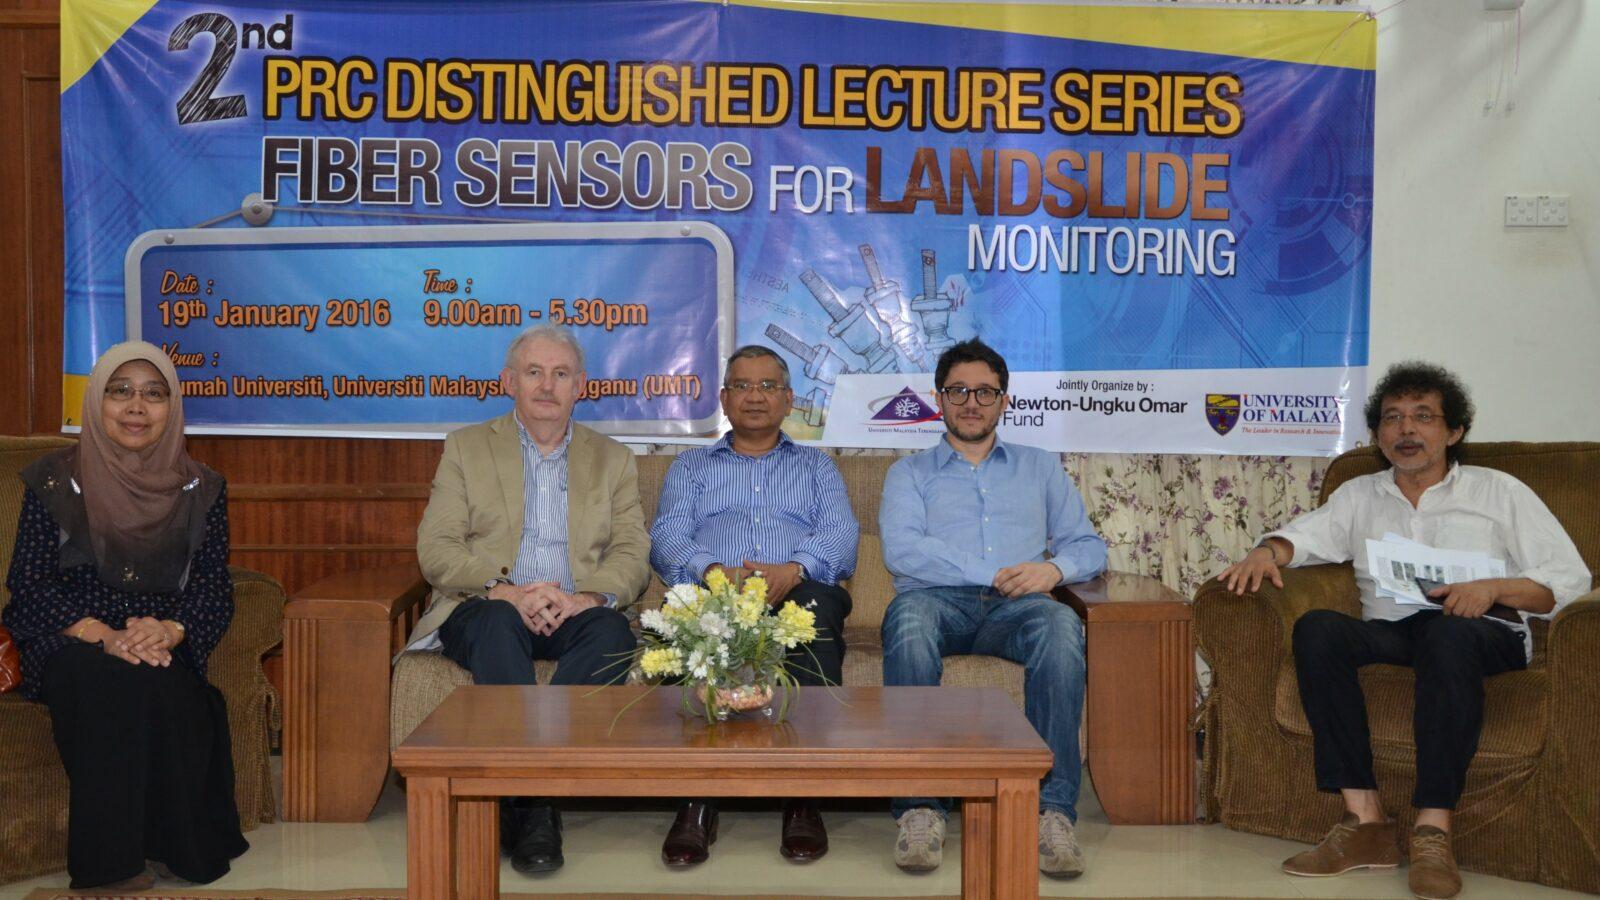 Malaysia landslide team sitting in front of workshop banner